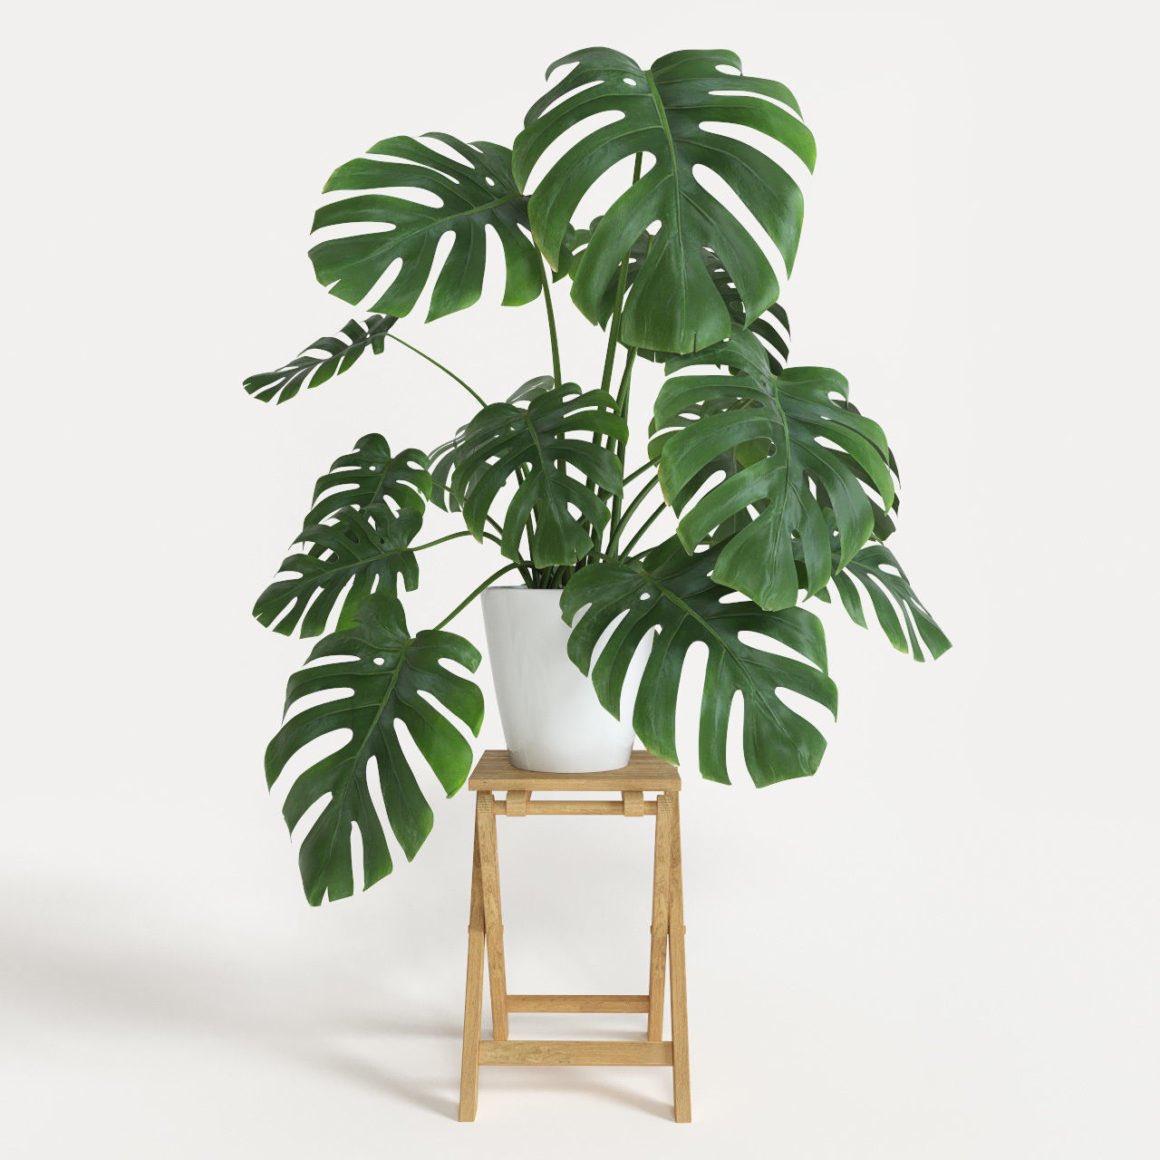 "nuttbpsen on Twitter: ""สำหรับคนที่อยากปลูกต้นไม้ในบ้านหรือห้องนอน ..."